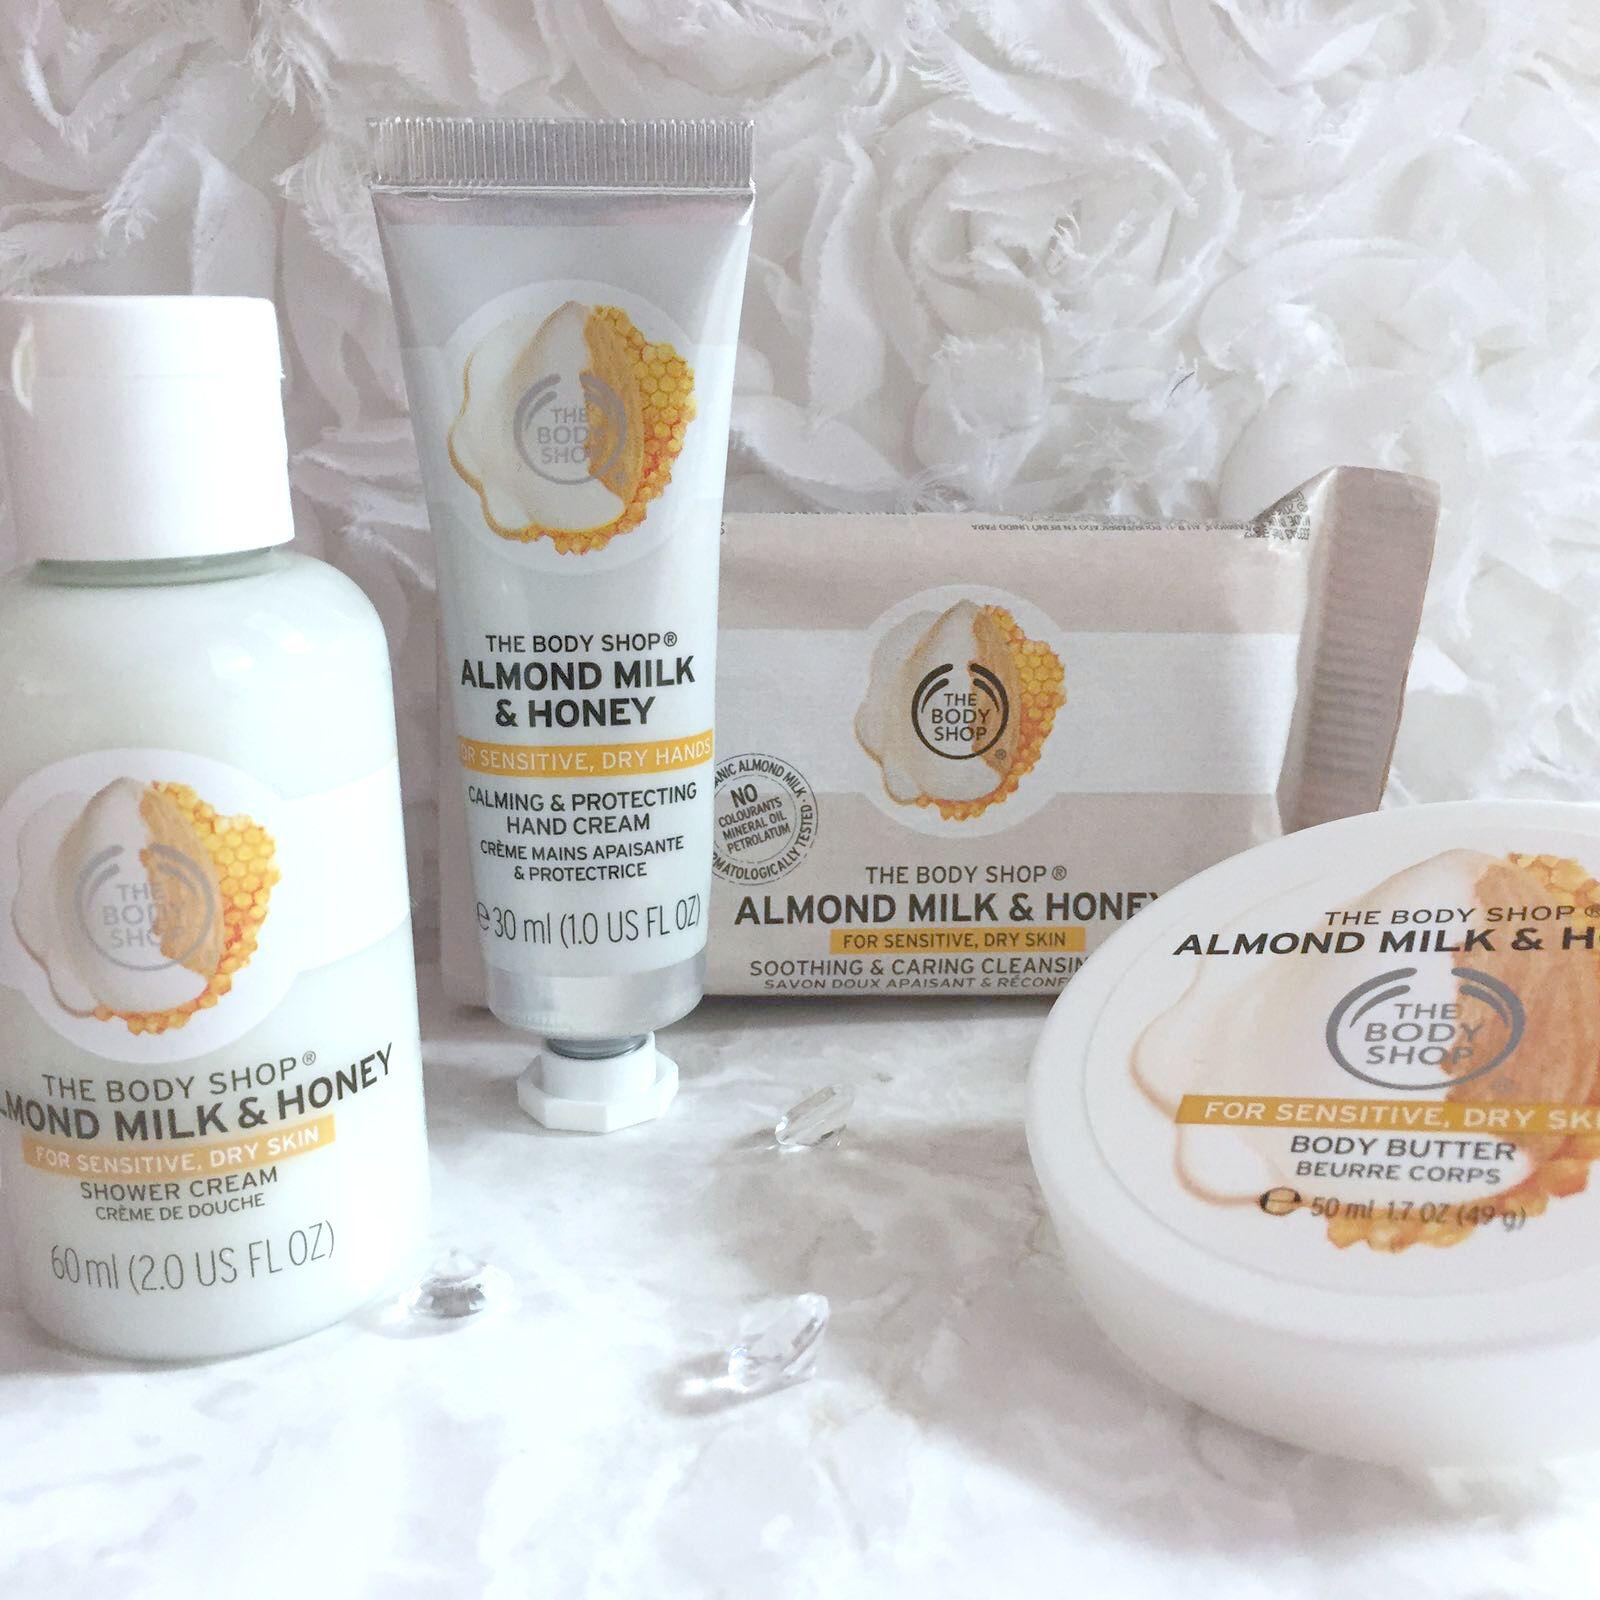 The Body Shop Almond Milk And Honey Range The body shop